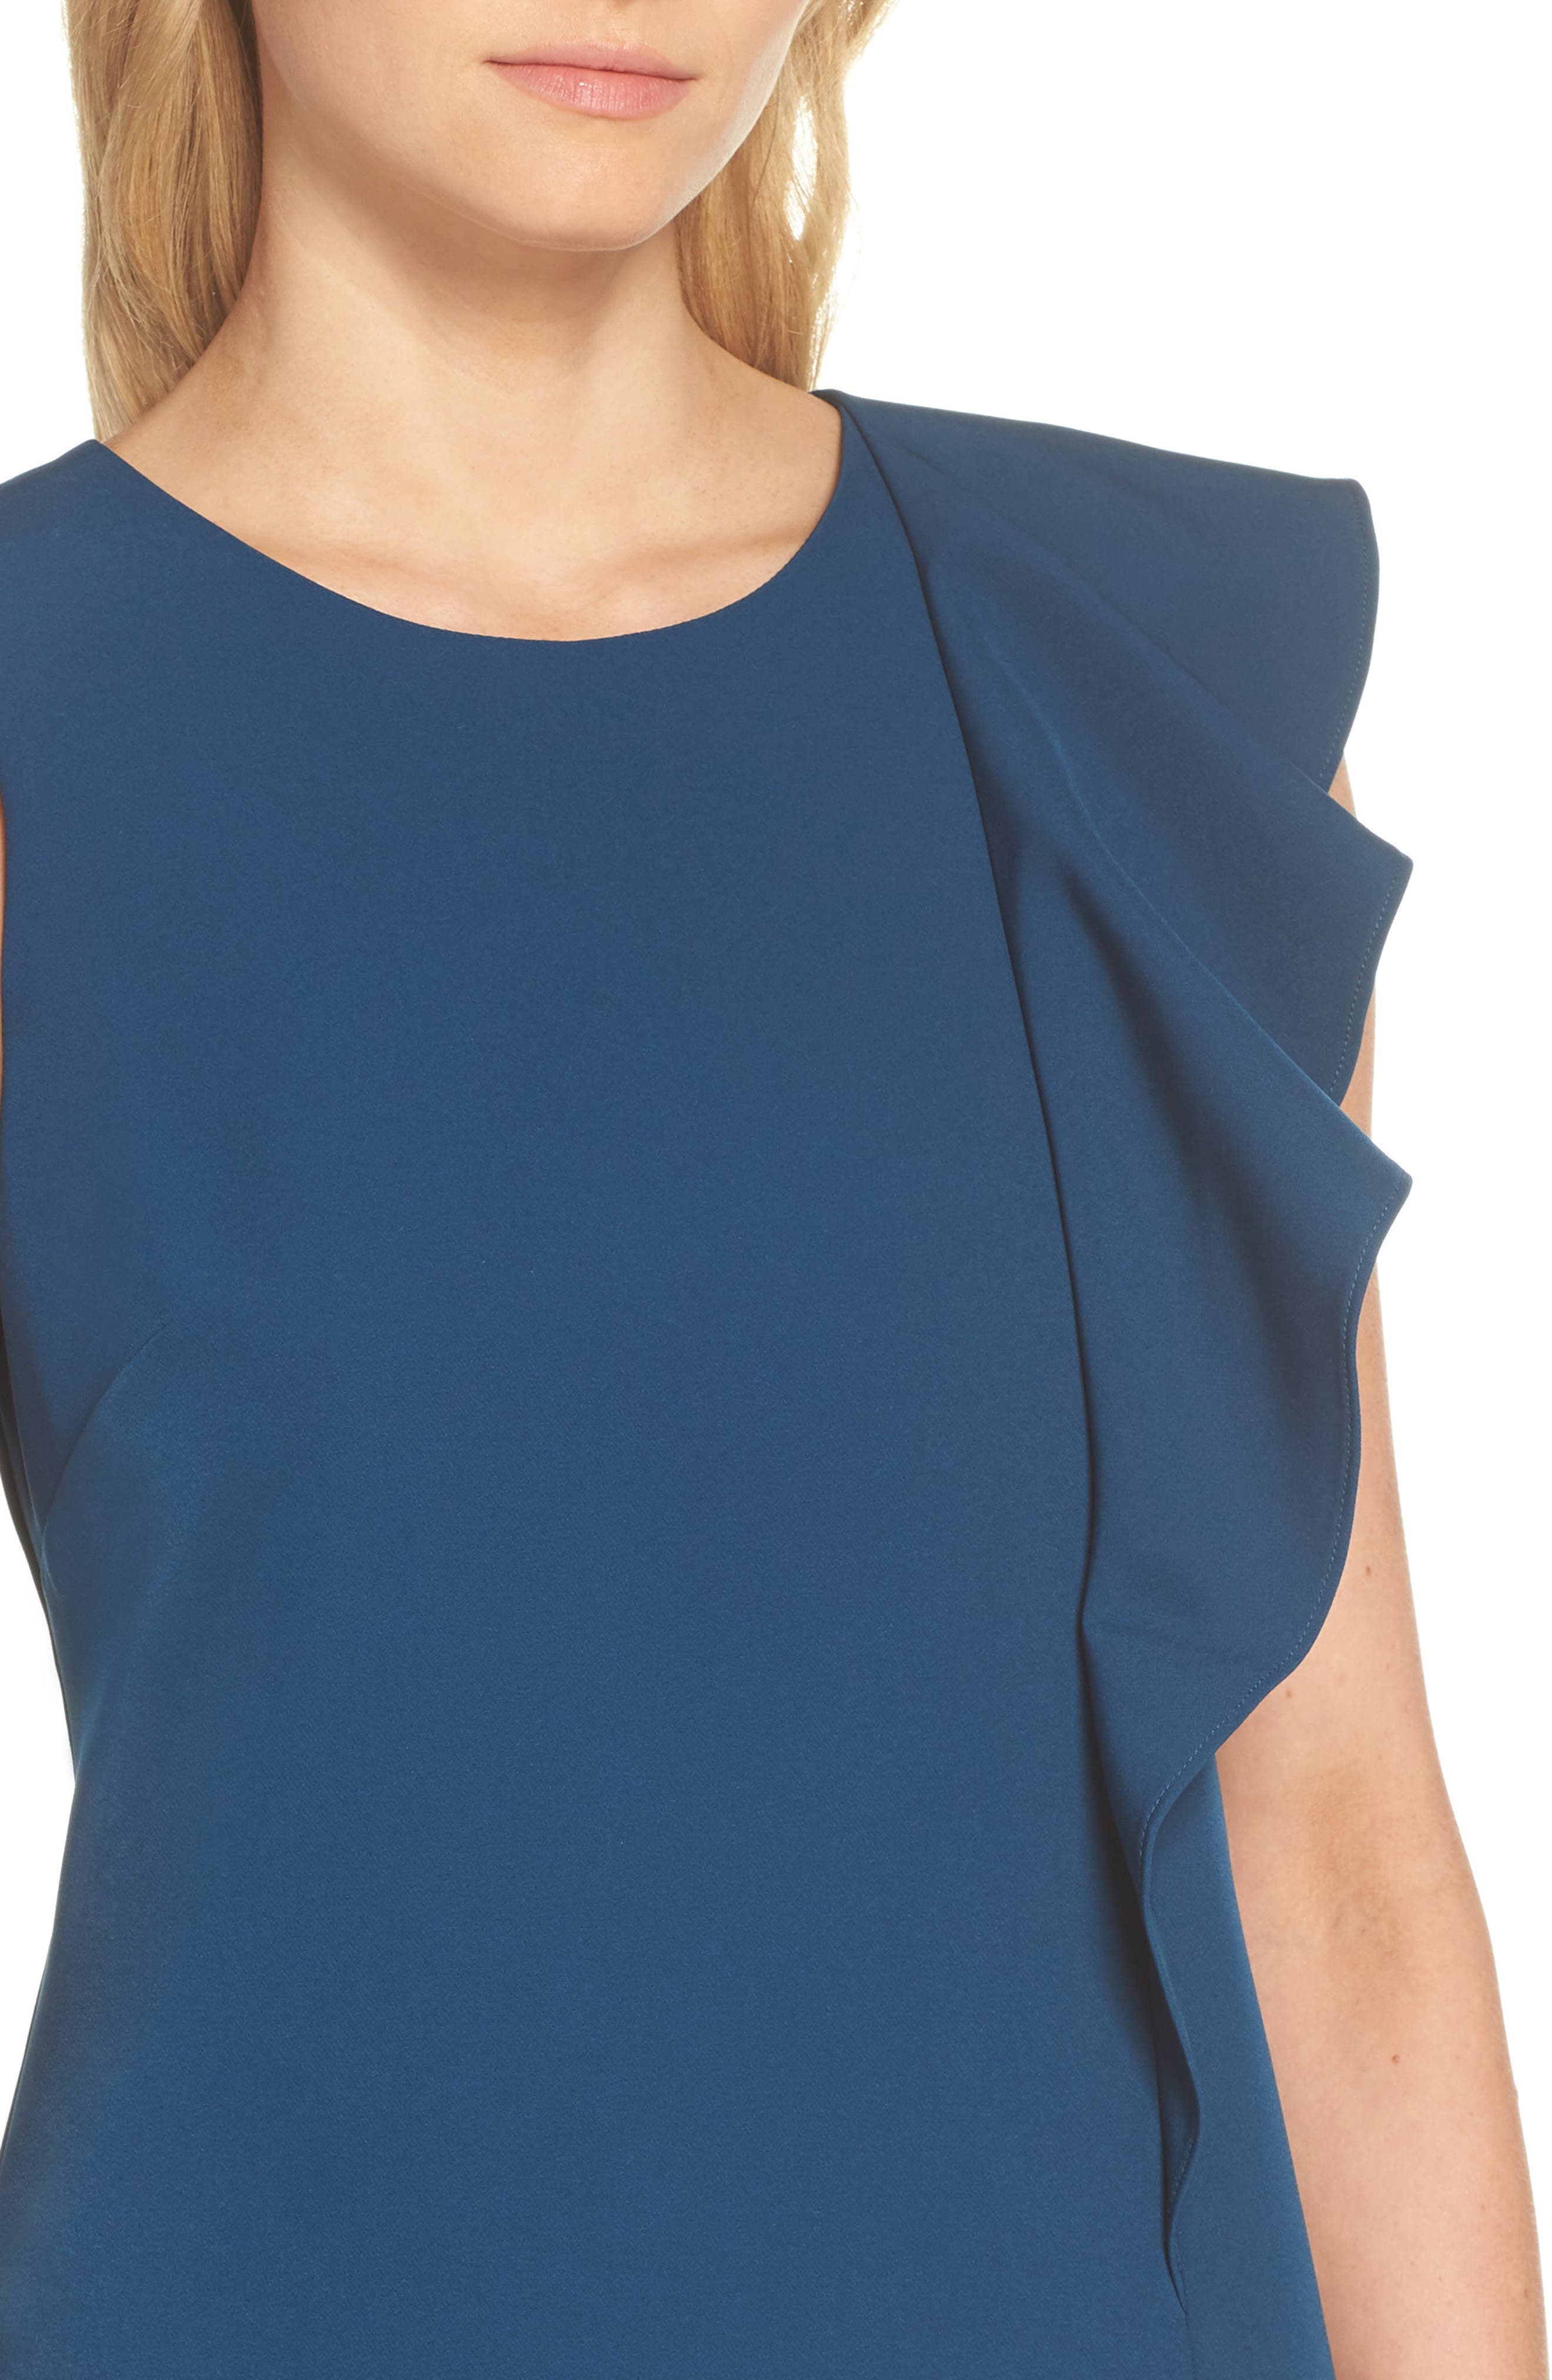 Ruffle Crepe A-Line Dress,                             Alternate thumbnail 4, color,                             450